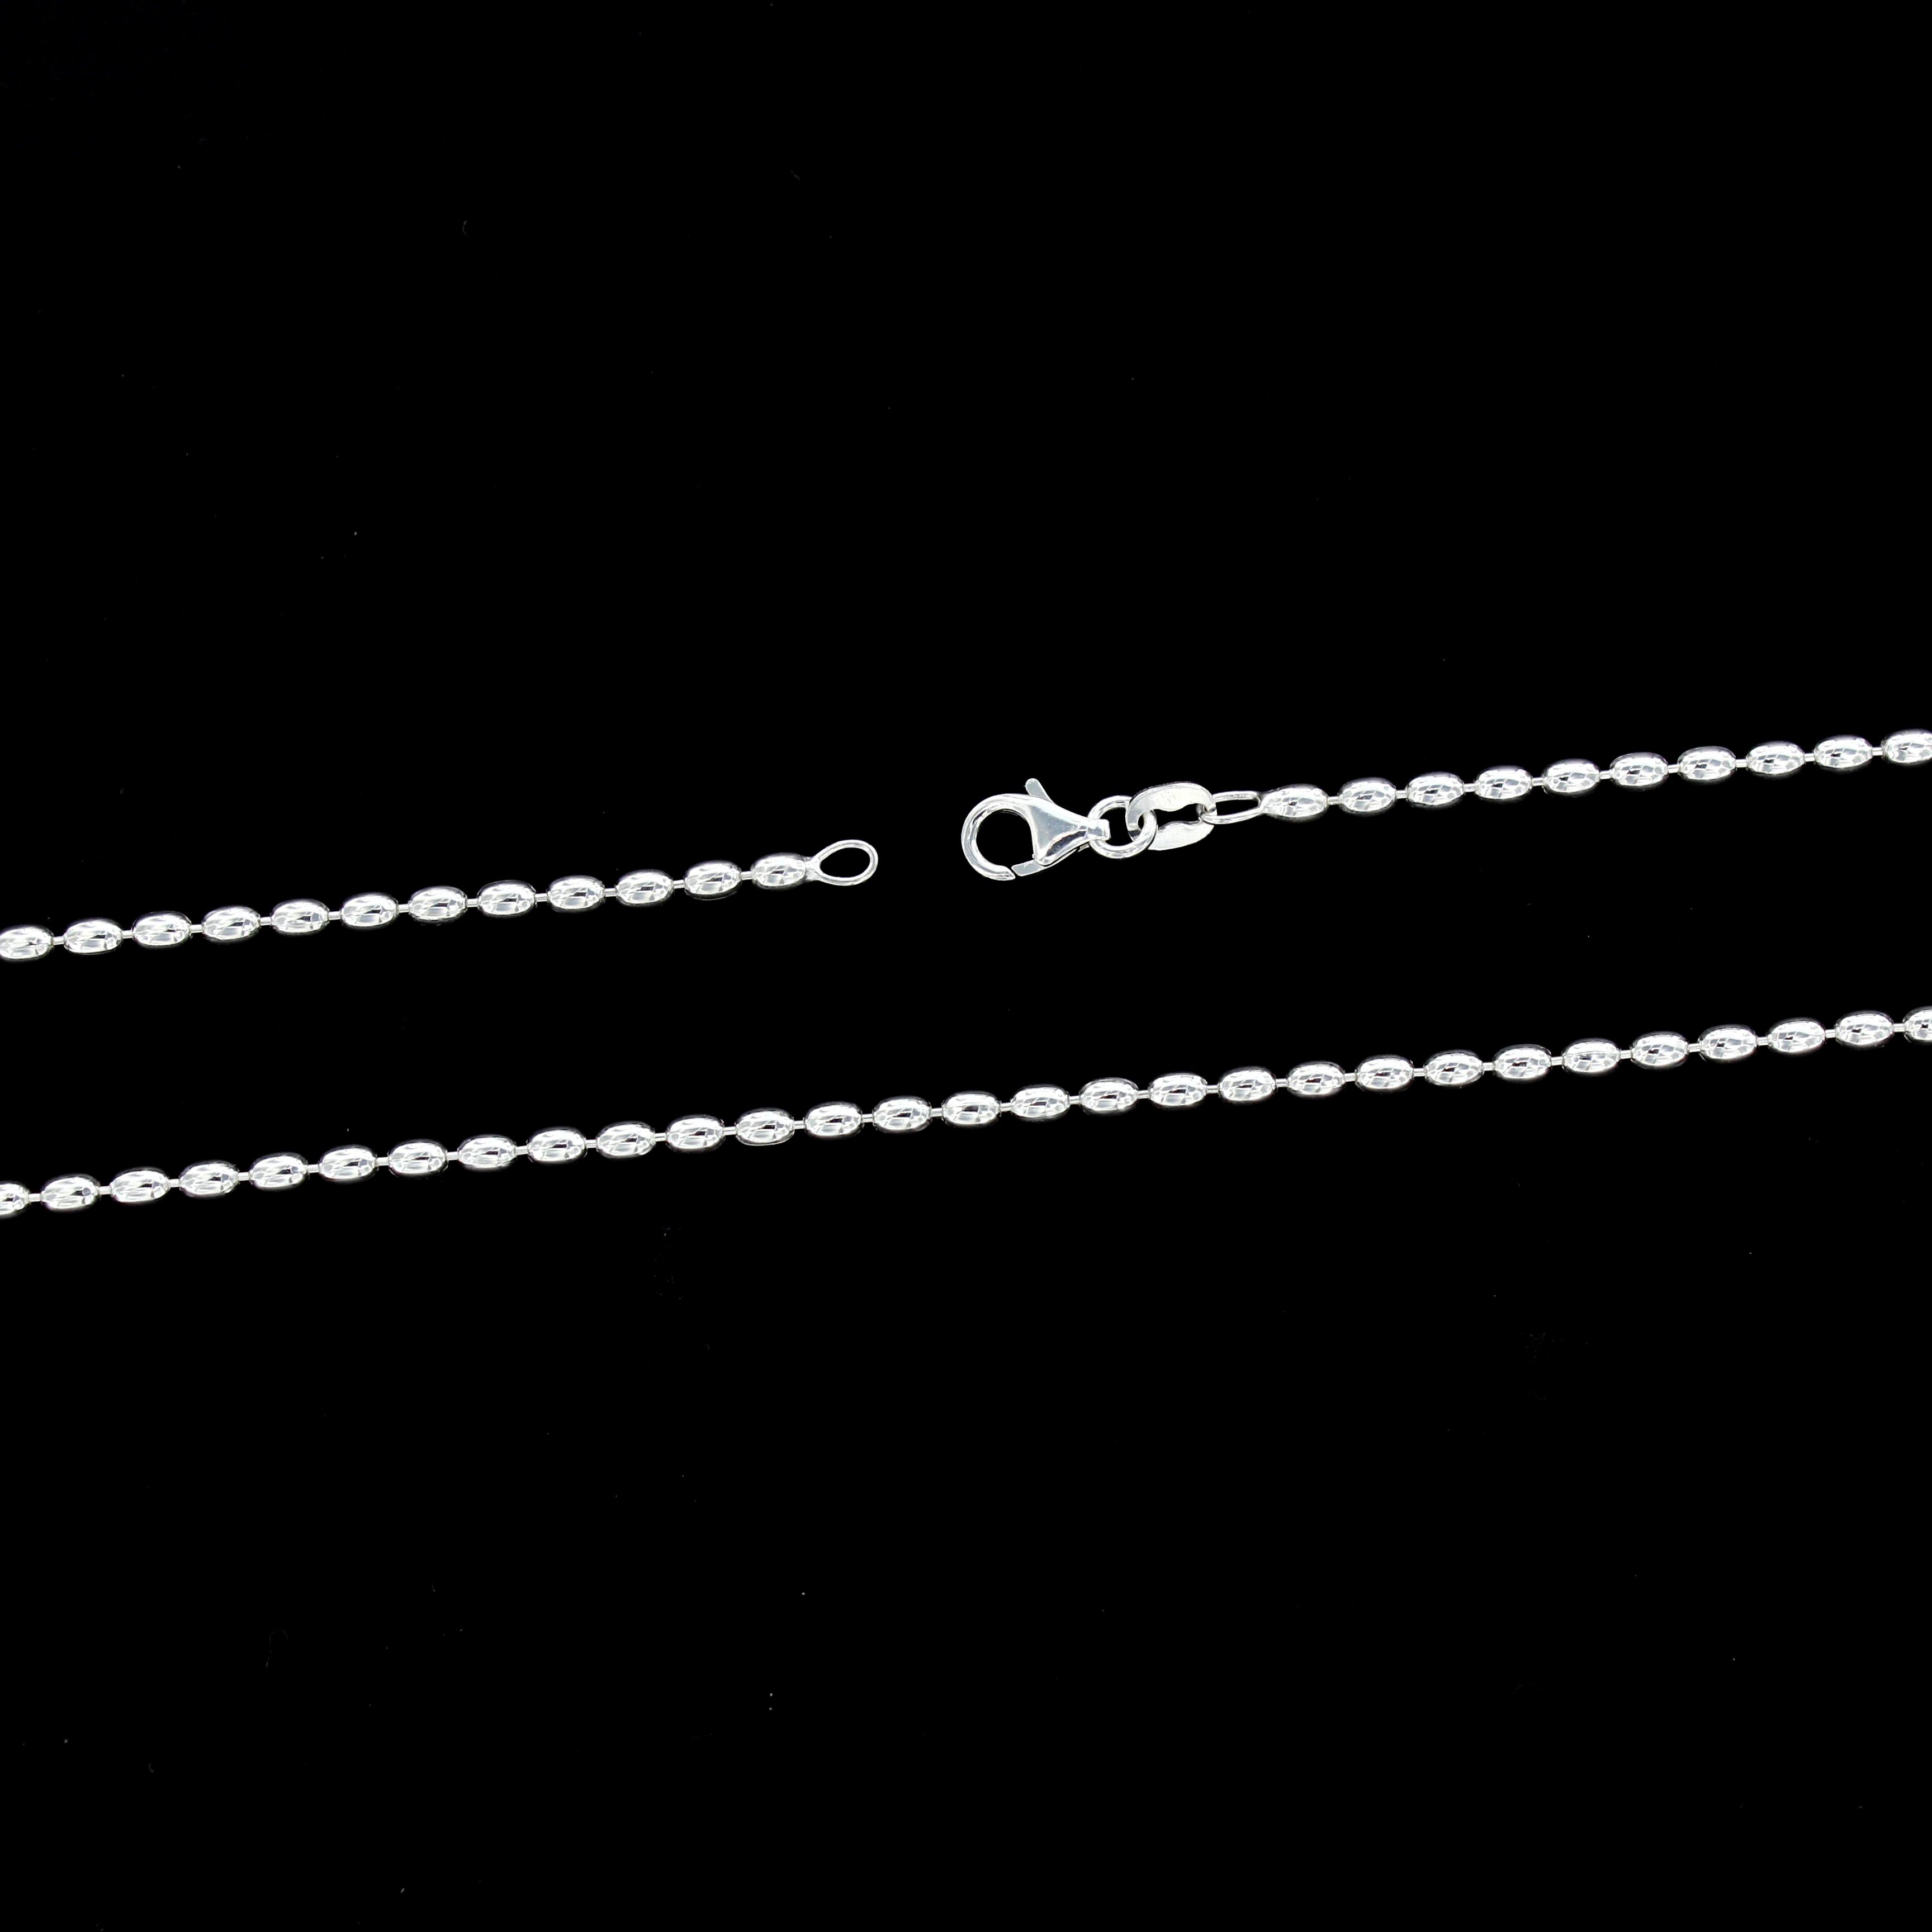 KAARIS CP093r OLIIVI KAULAKETJU 2,3 mm RODINOITU